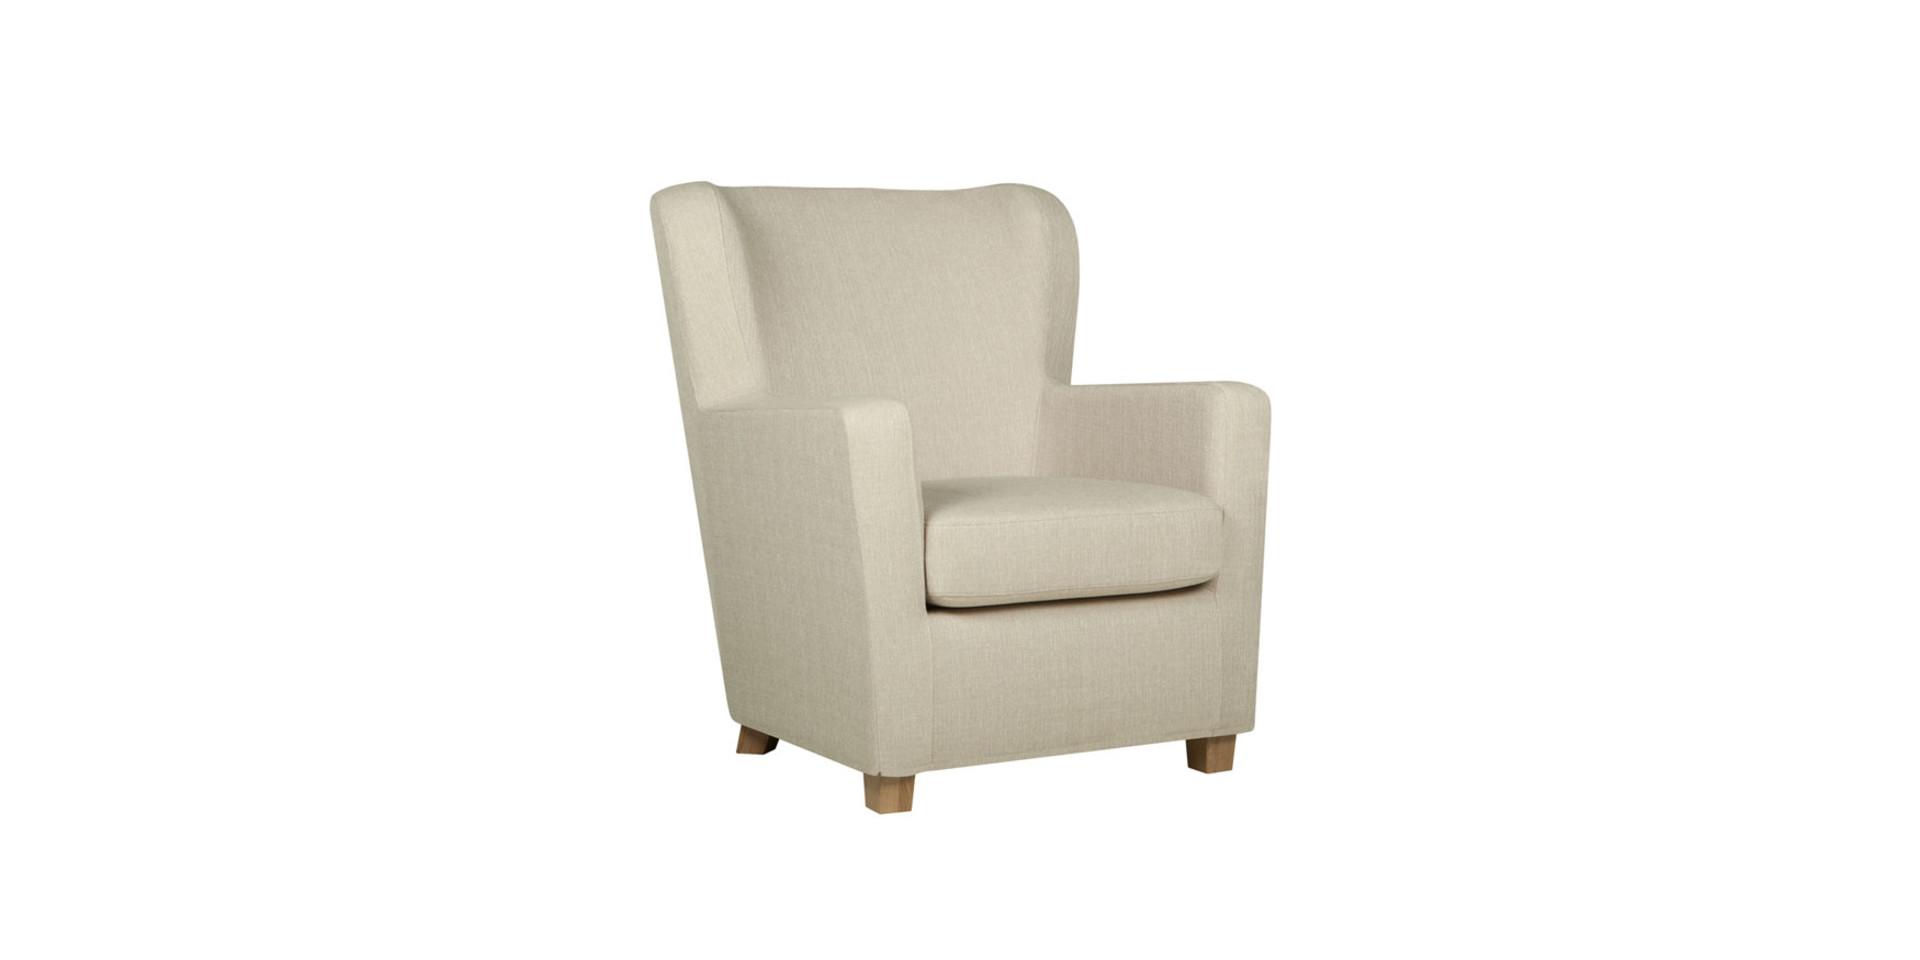 sits-ellen-fauteuil-armchair_cedros2_beige_2